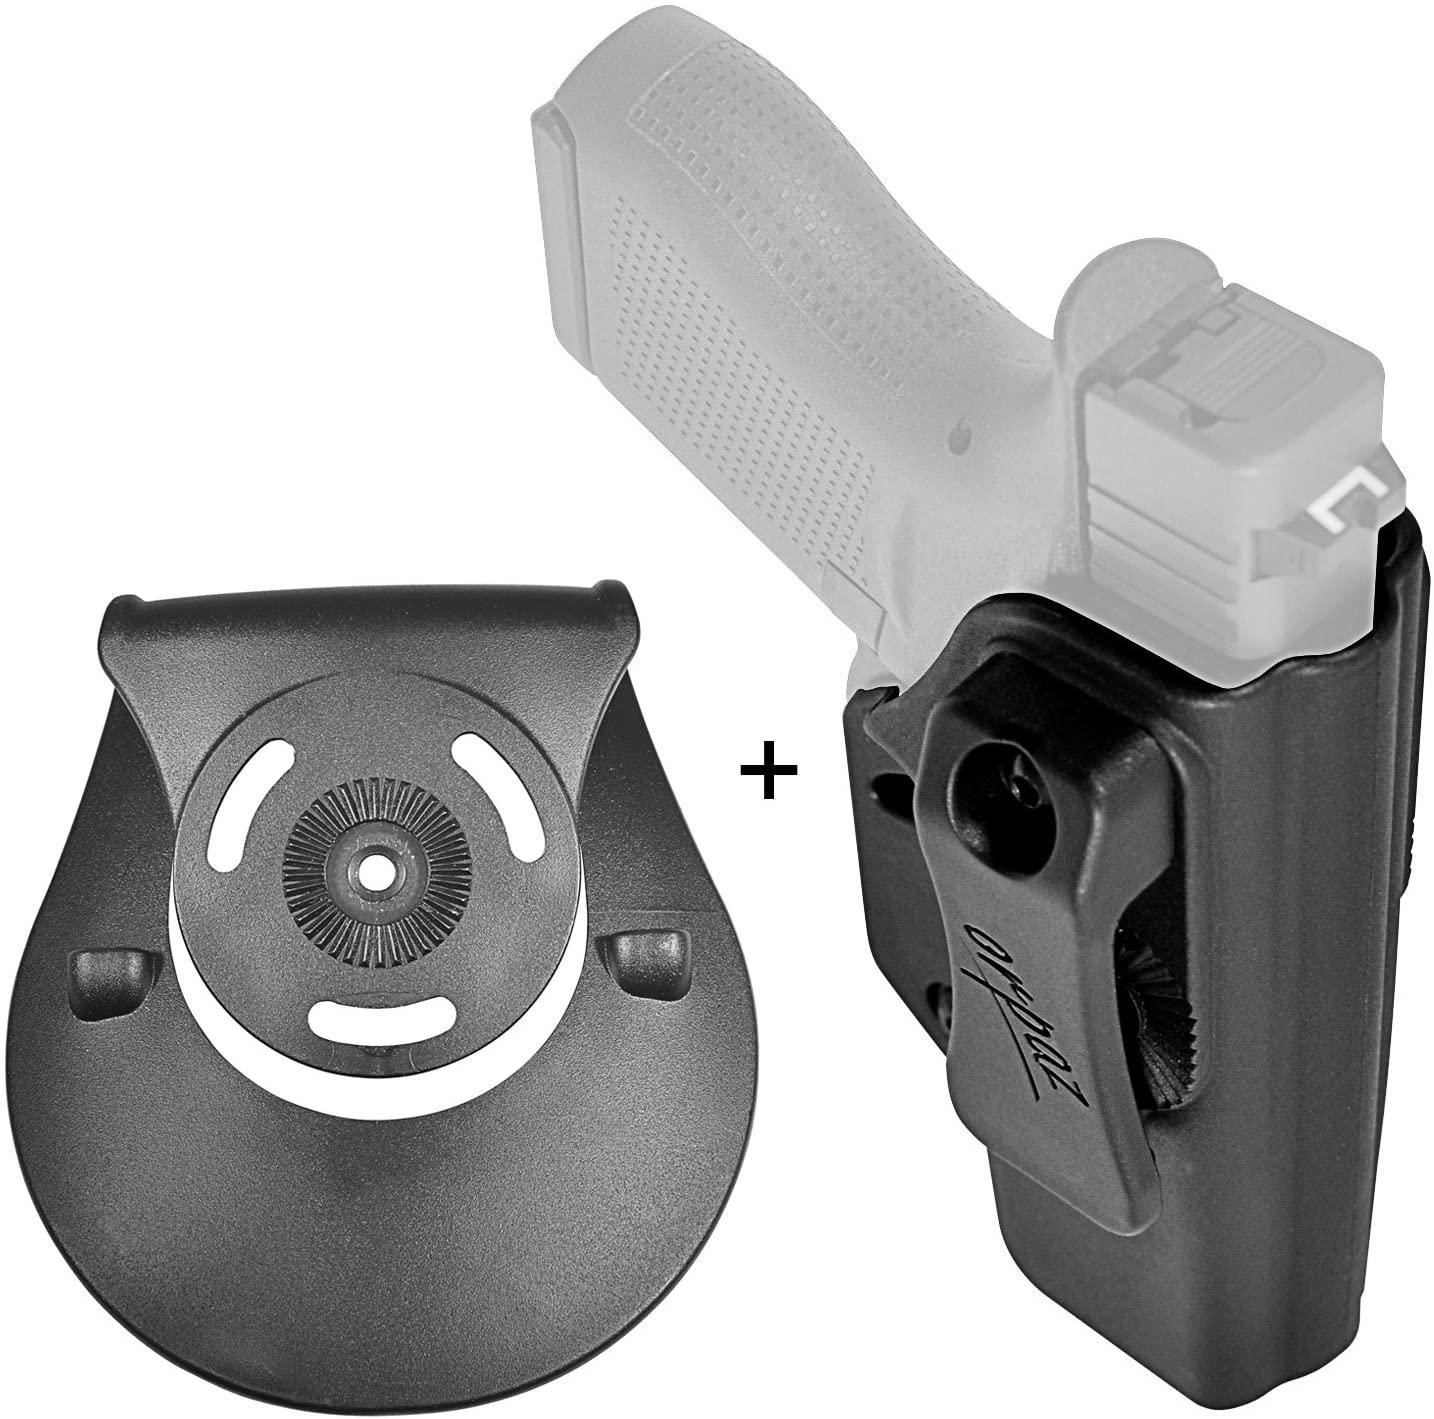 Orpaz Glock 43 Holster IWB Holster Glock 43 CCW Holster